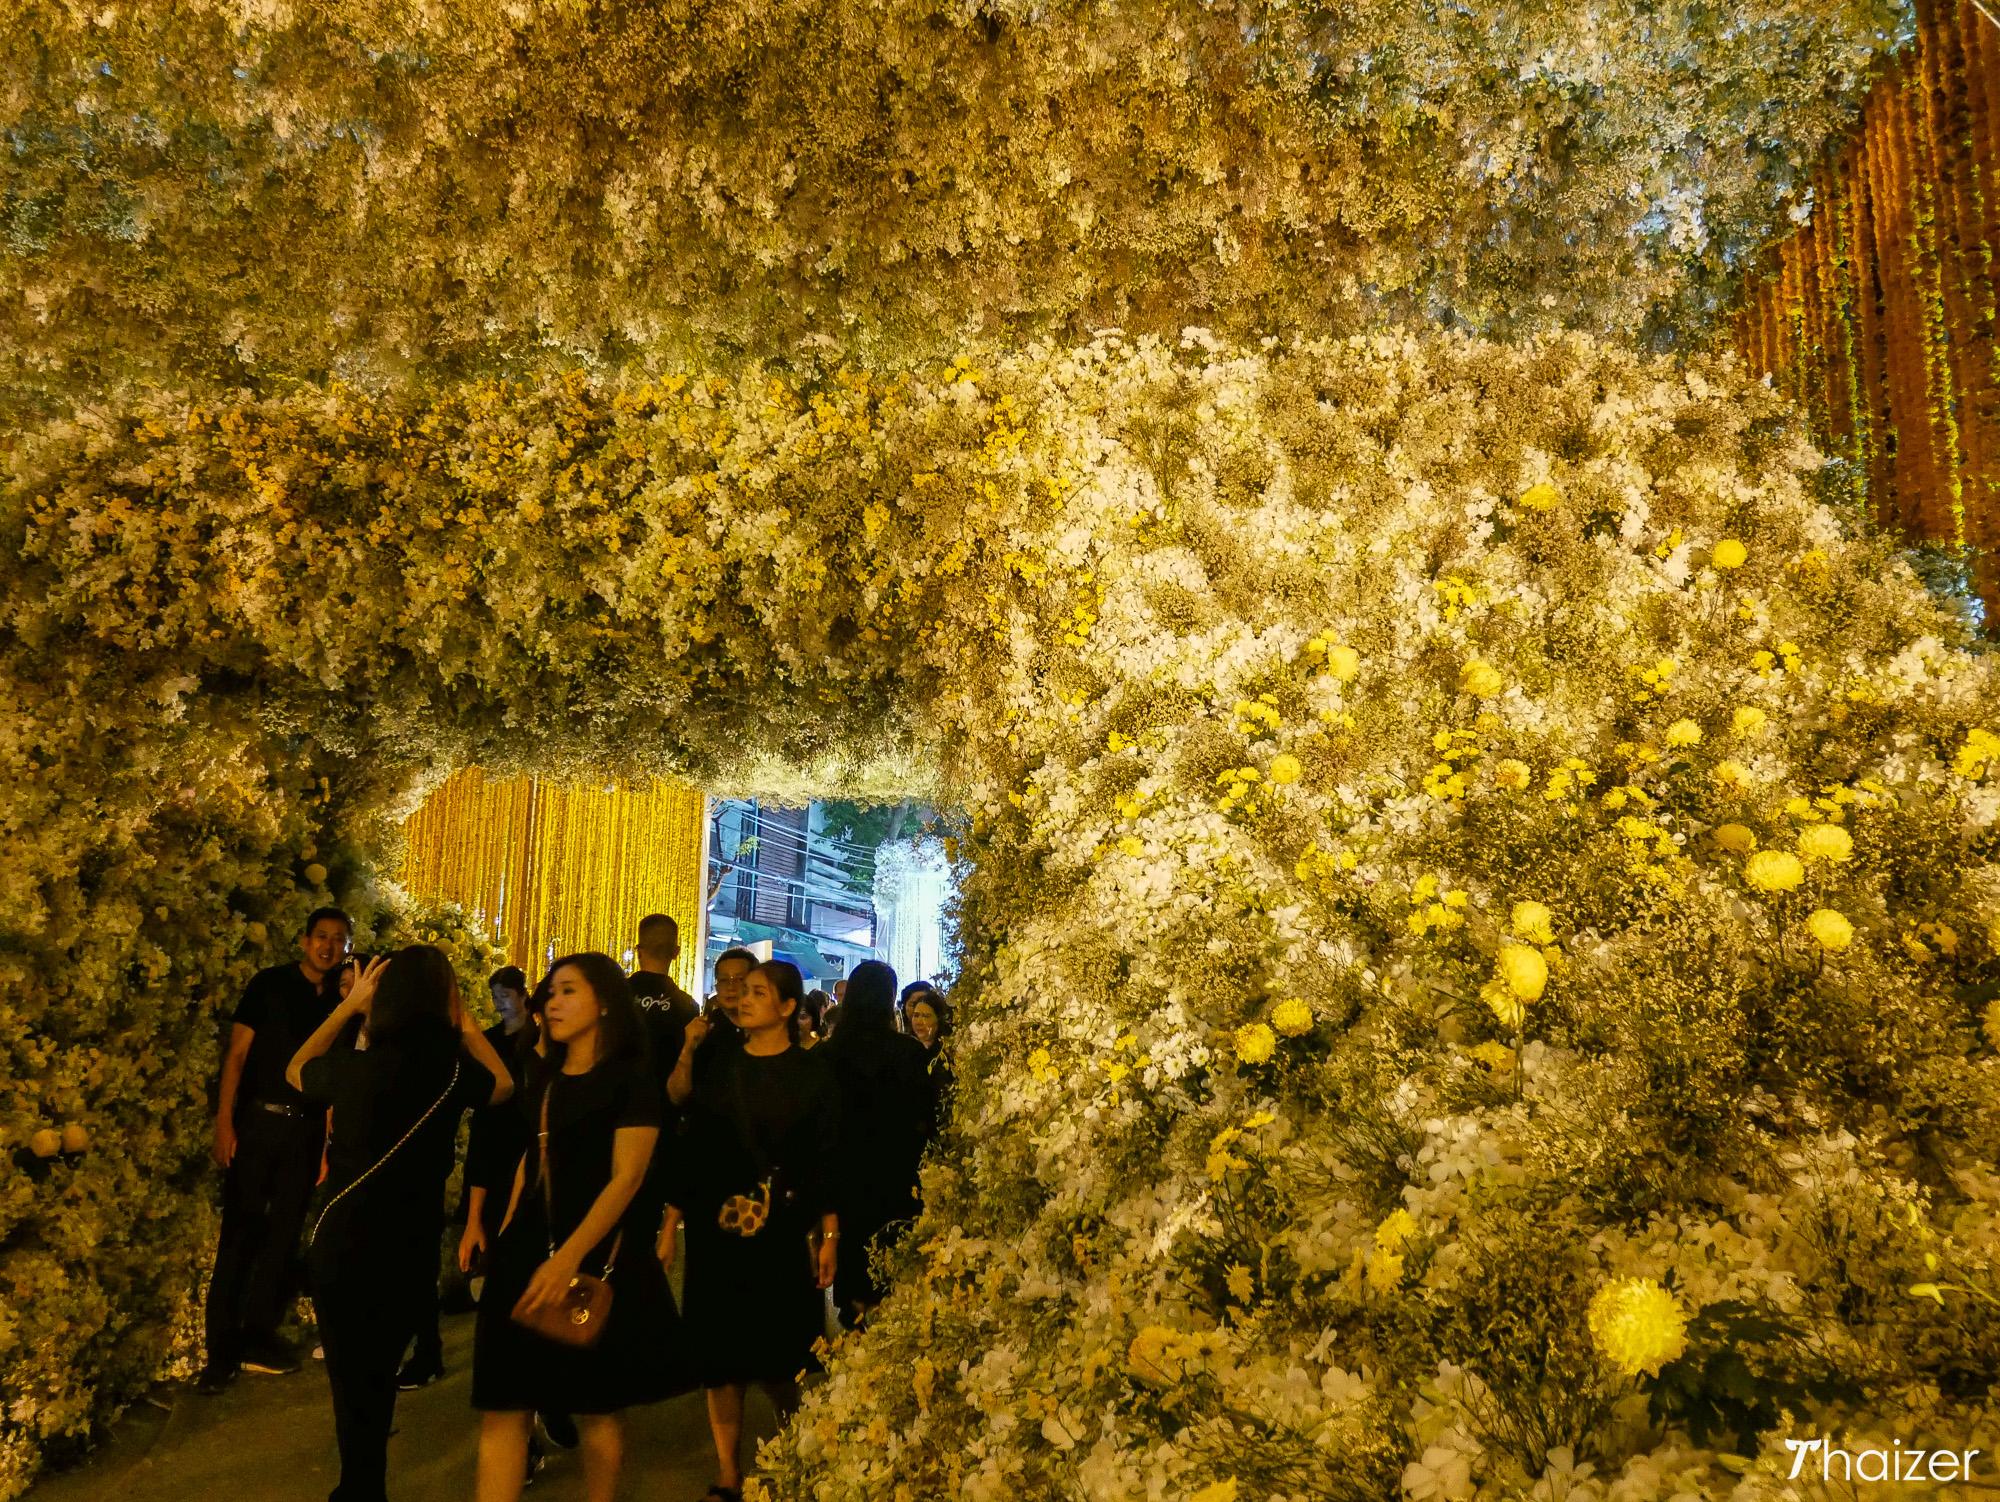 Pak Klong Talad floral archway